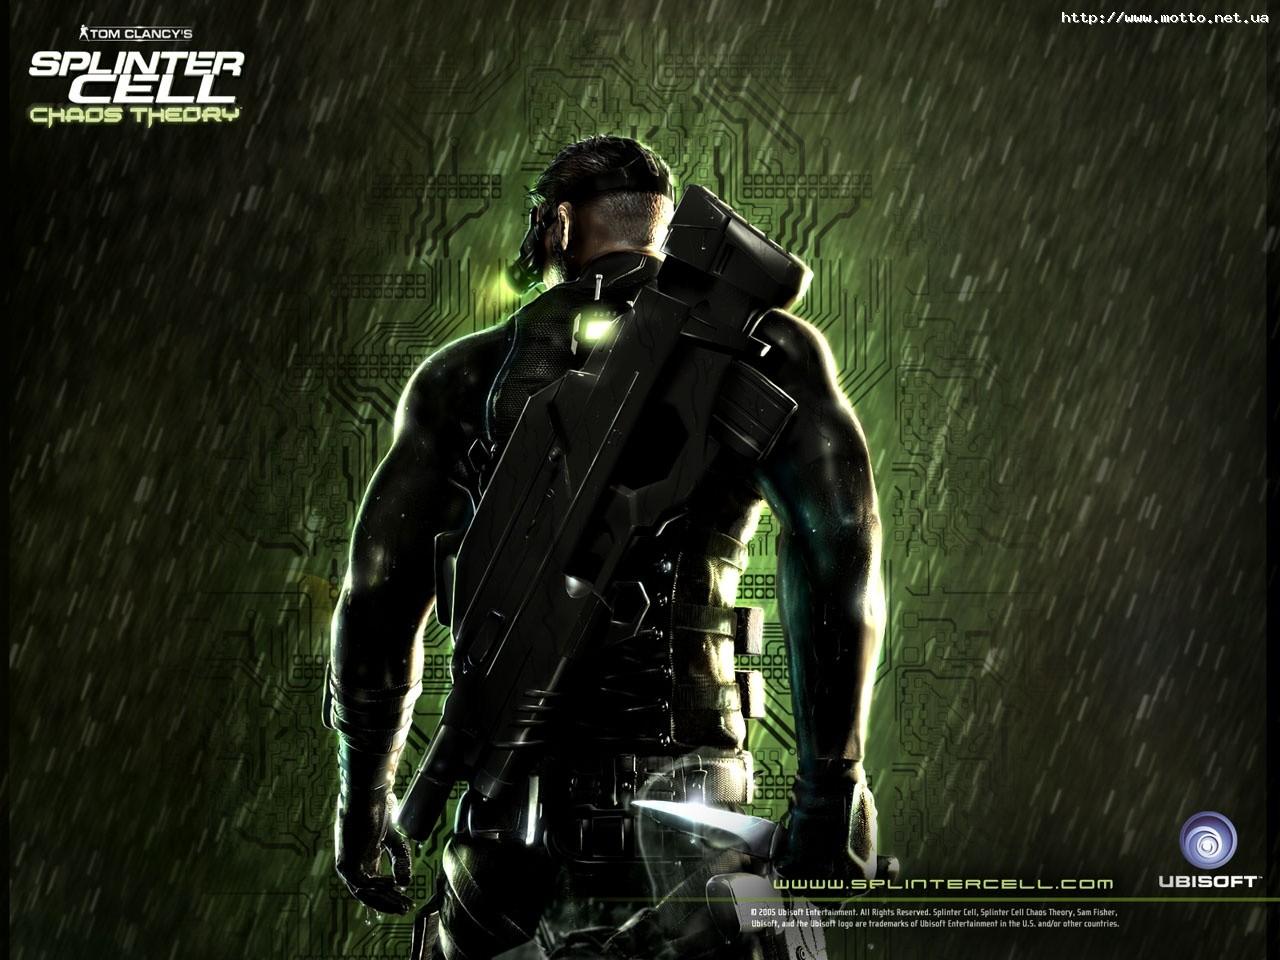 Обои Splinter Cell 3 Chaos Theory.